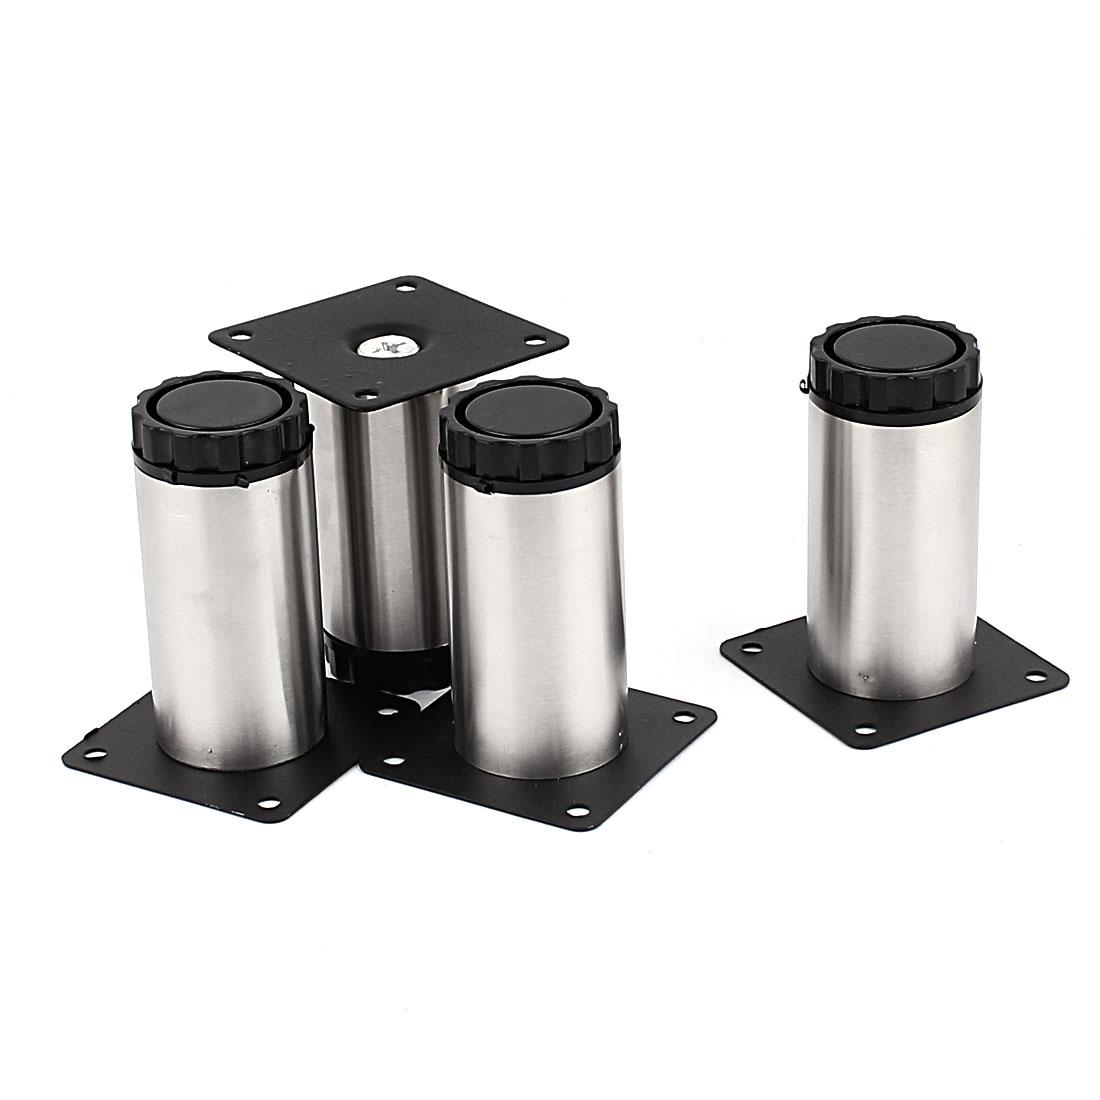 80mm Length Adjustable Cabinet Legs 4pcs for Furniture Sofa Tea Table Bed Shelf